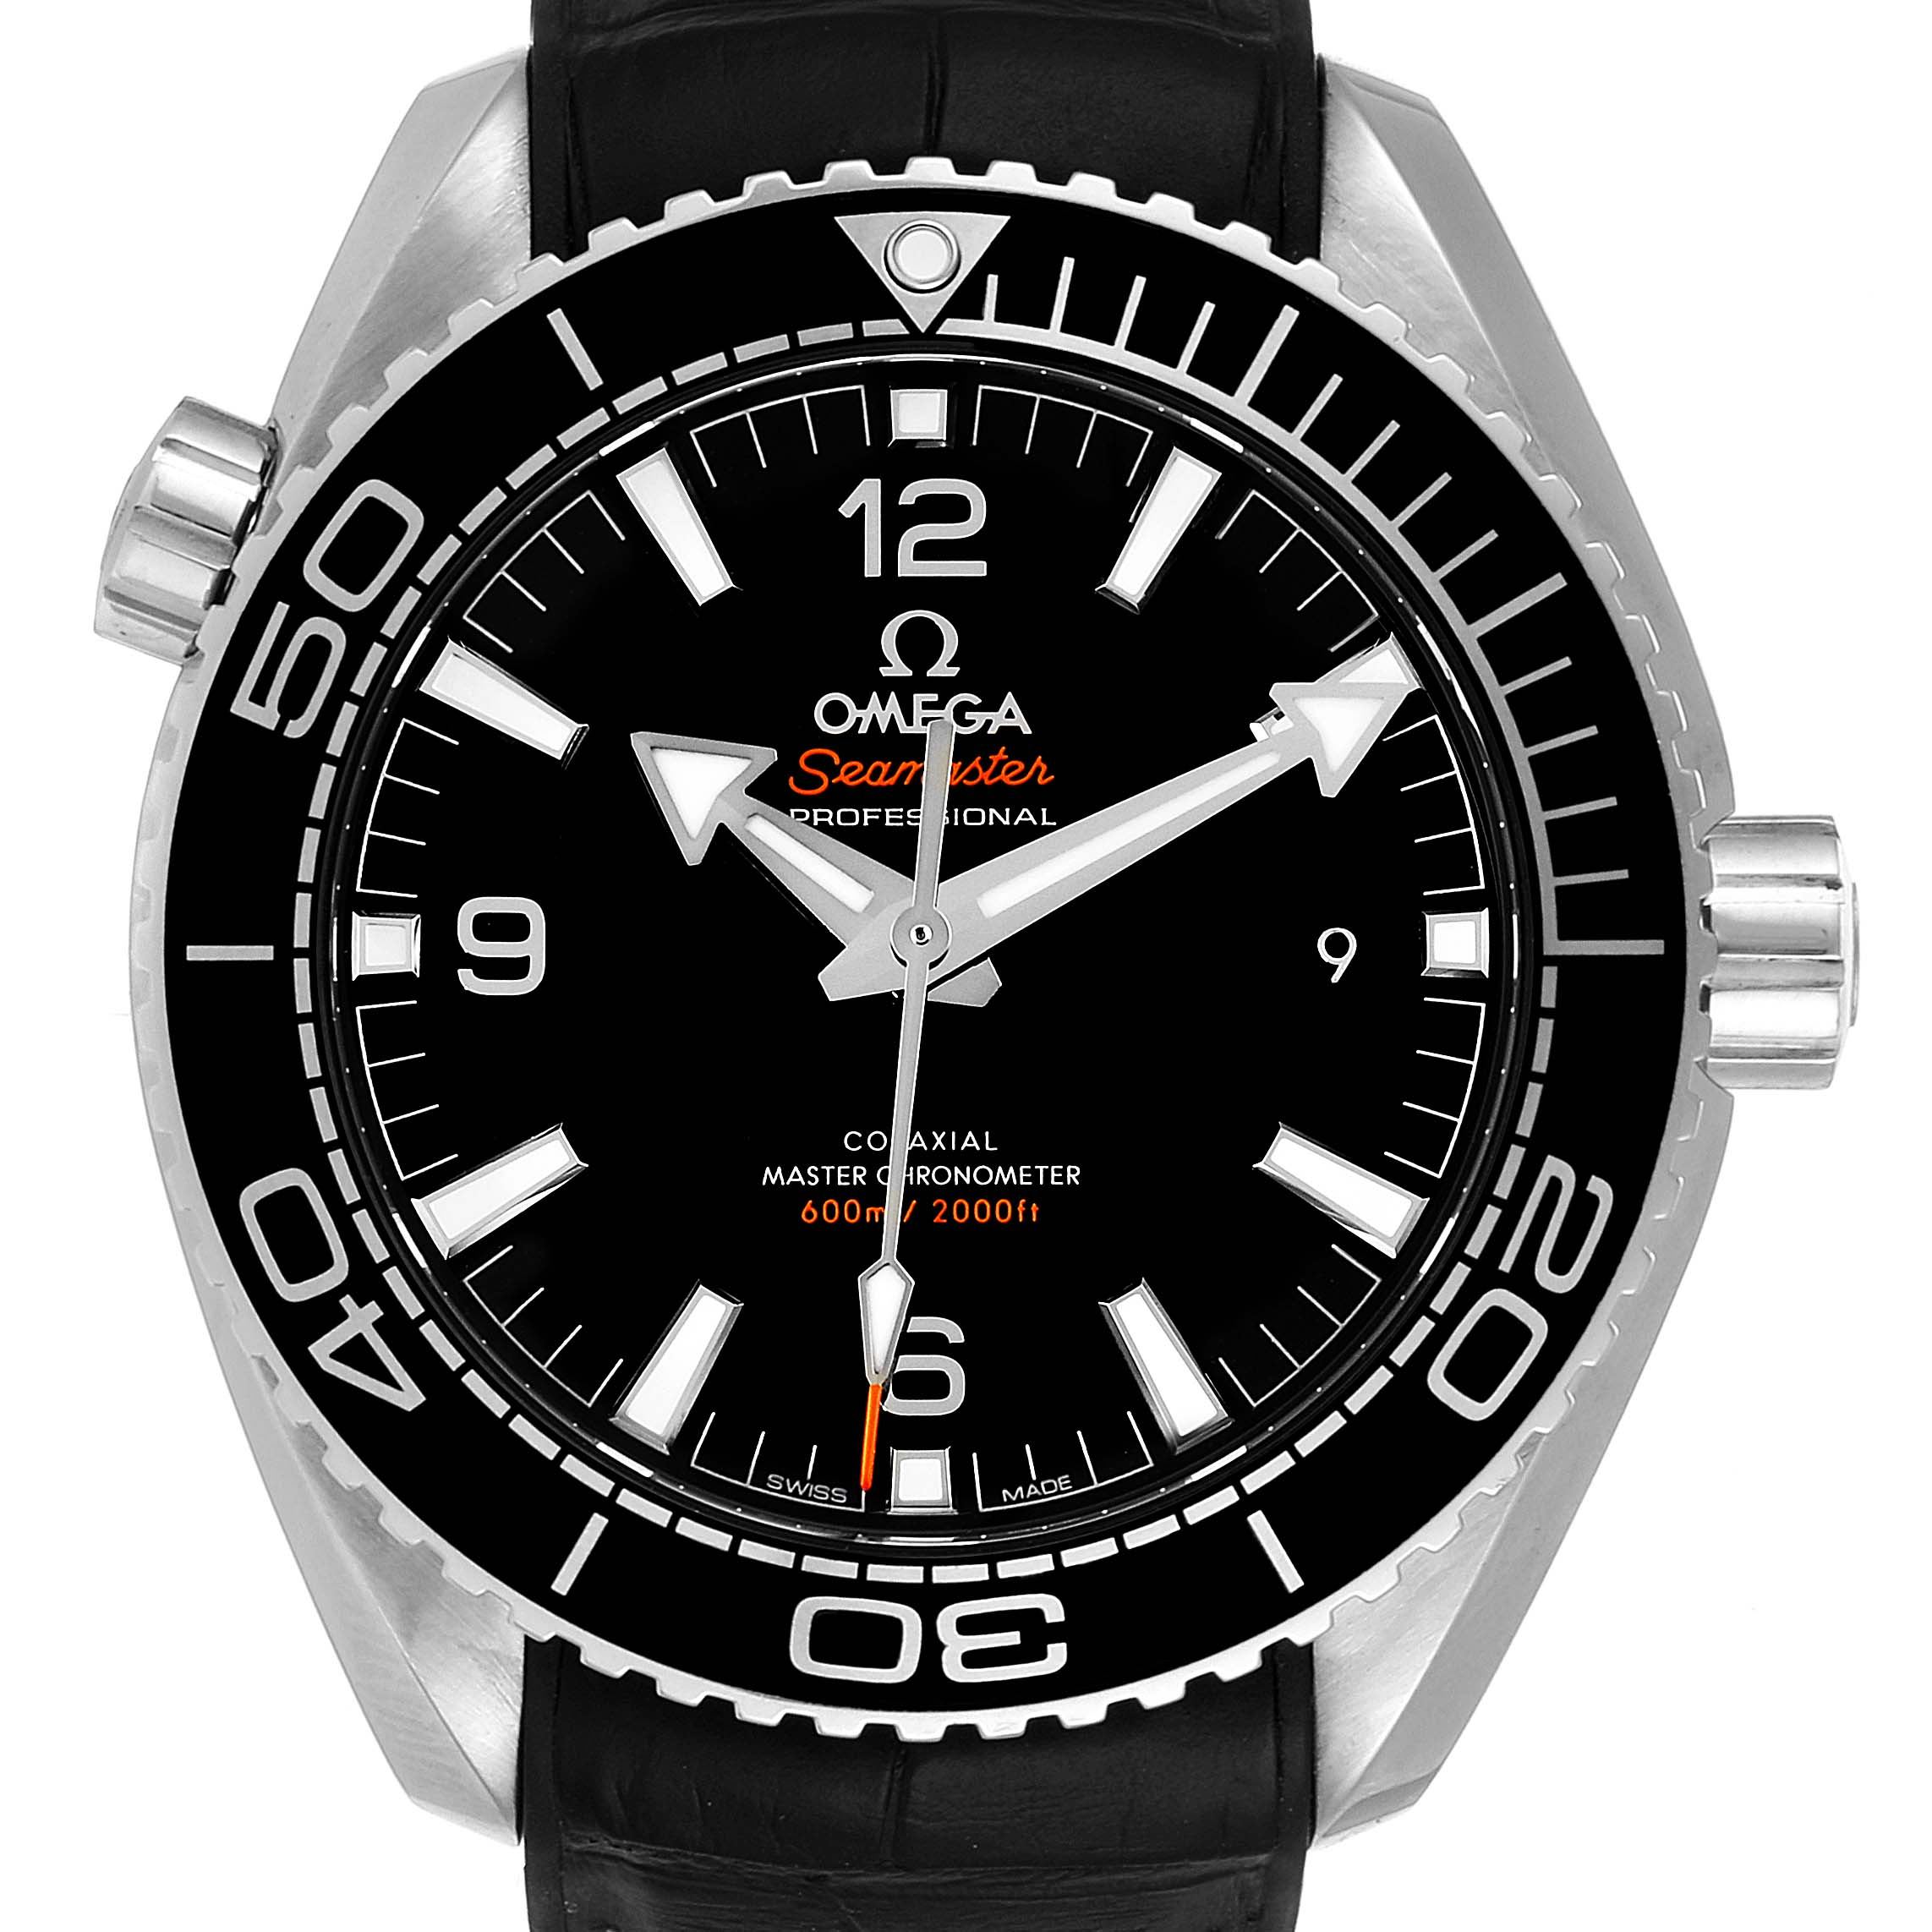 Omega Seamaster Planet Ocean 600m Mens Watch 215.33.44.21.01.001 Box Card SwissWatchExpo